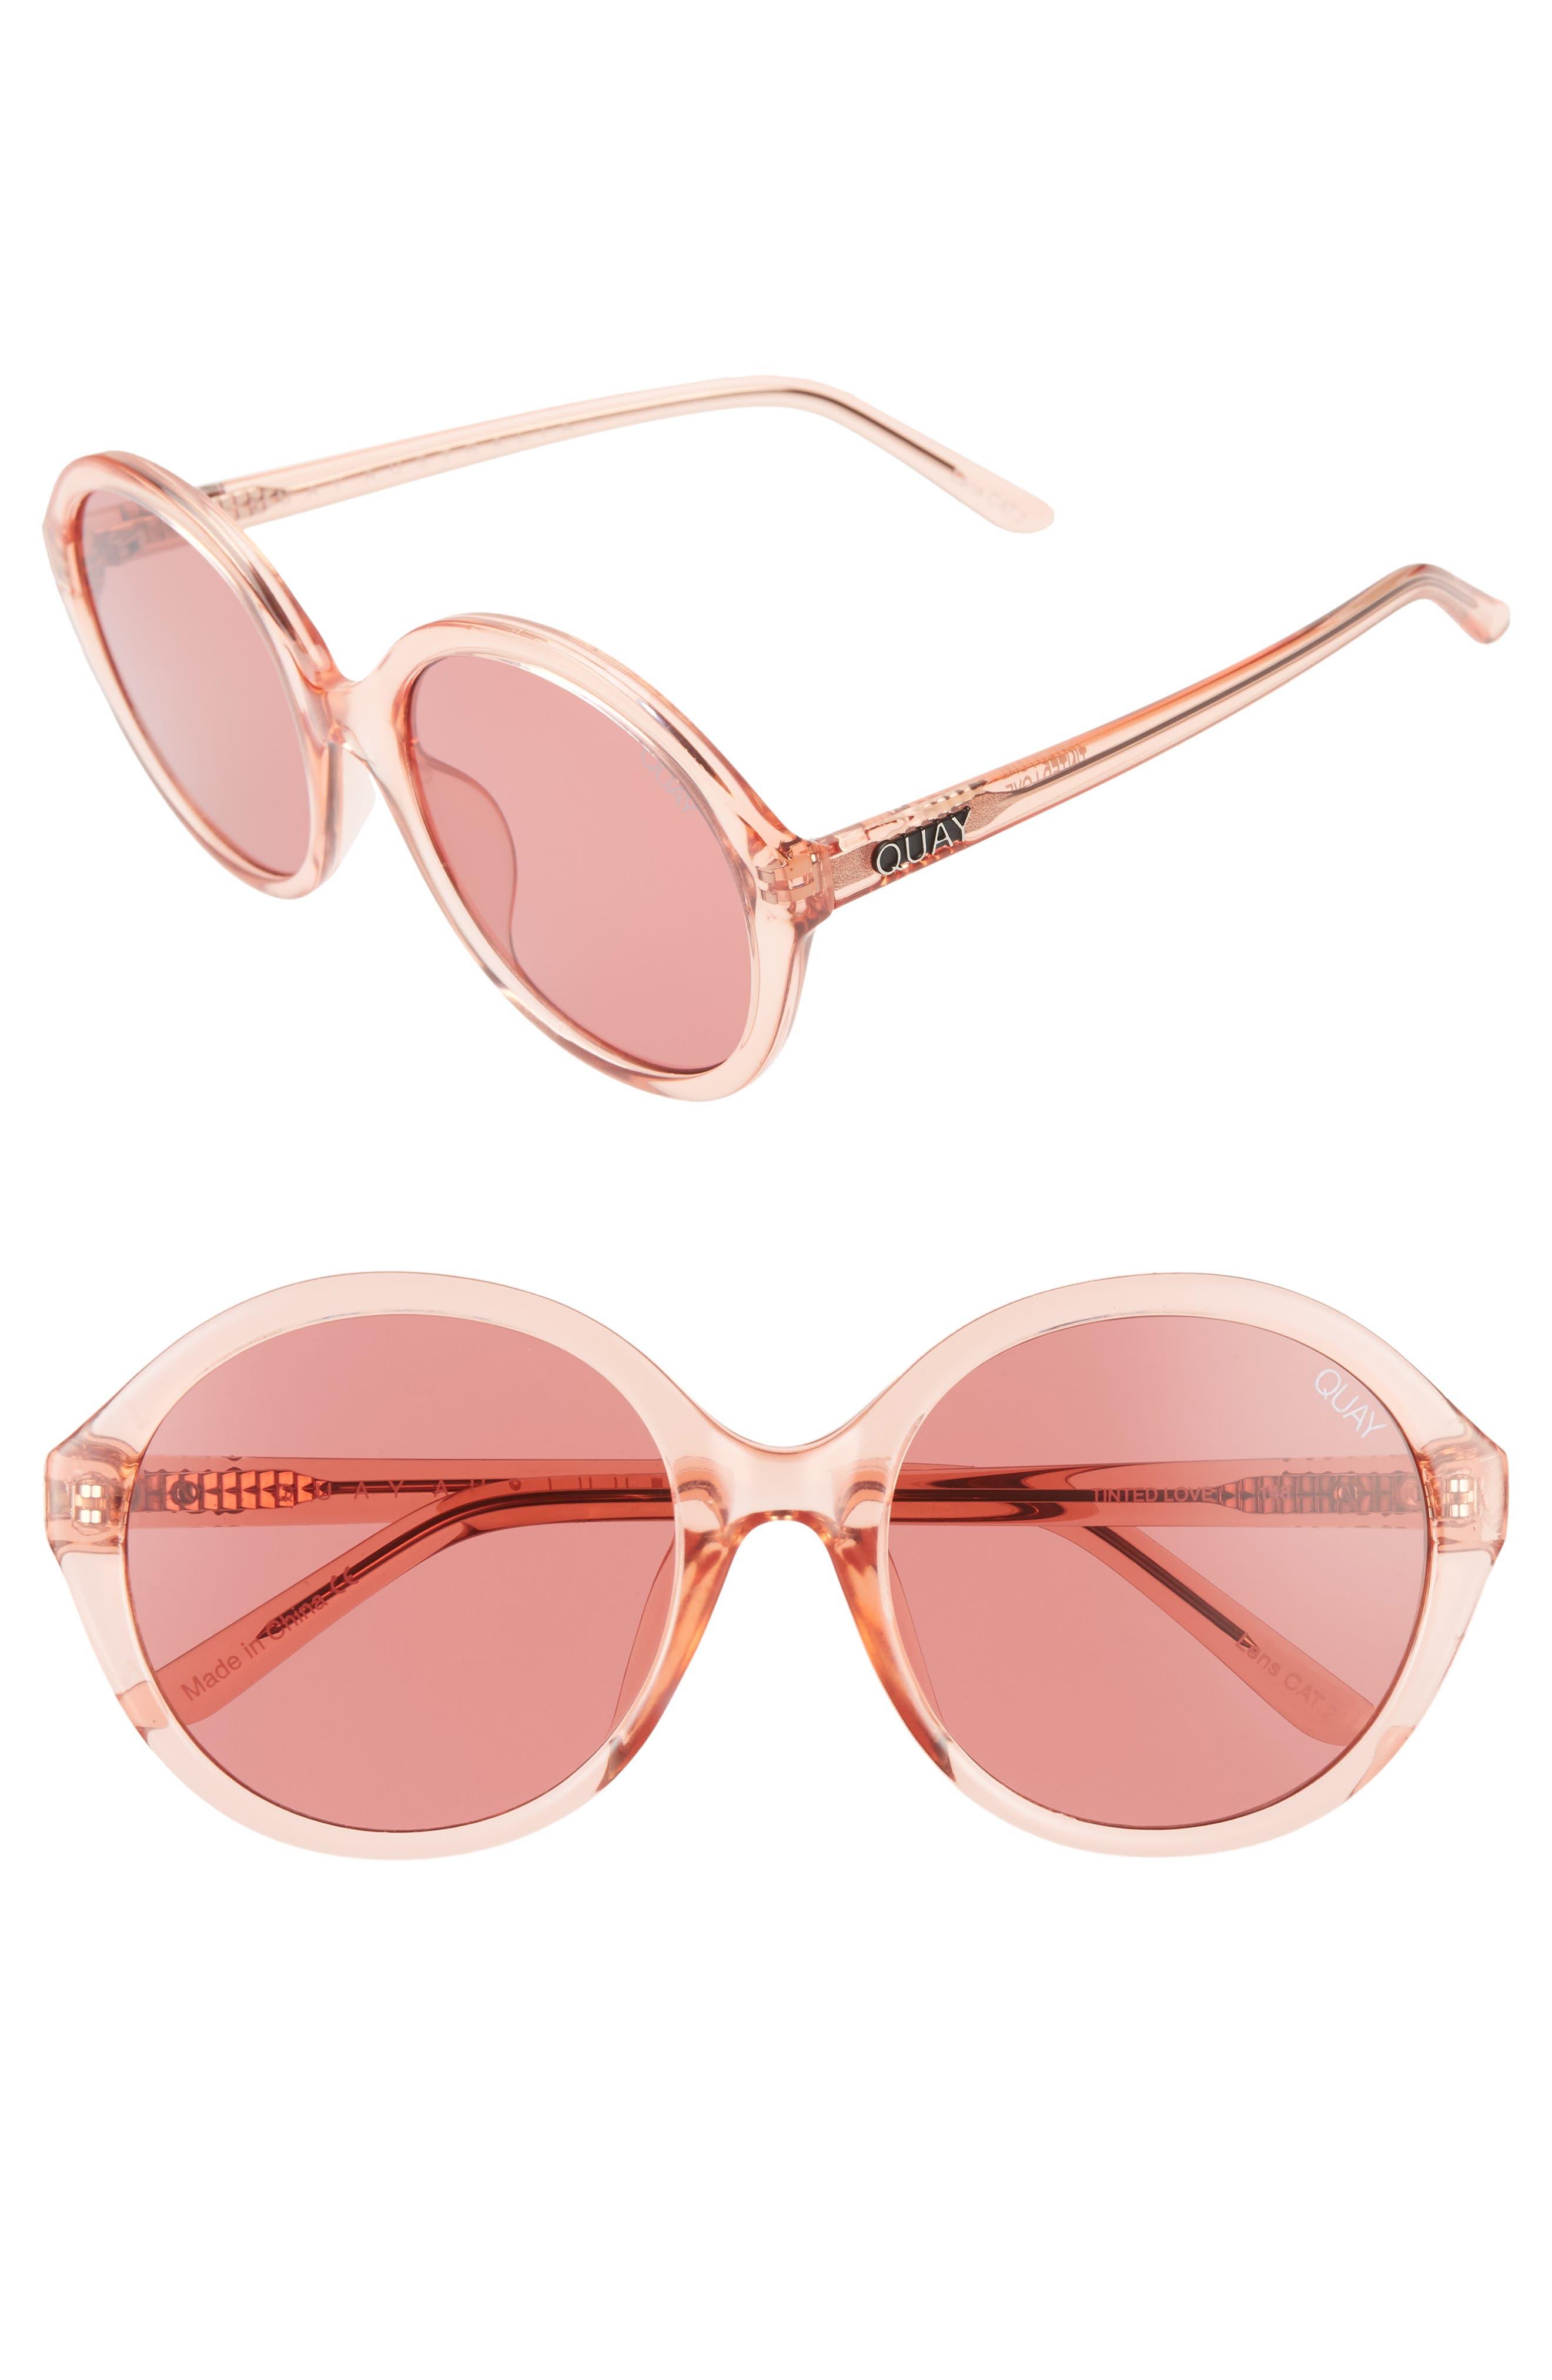 Quay Australia X Benefit Tinted Love 55Mm Round Sunglasses - Pink/ Pink